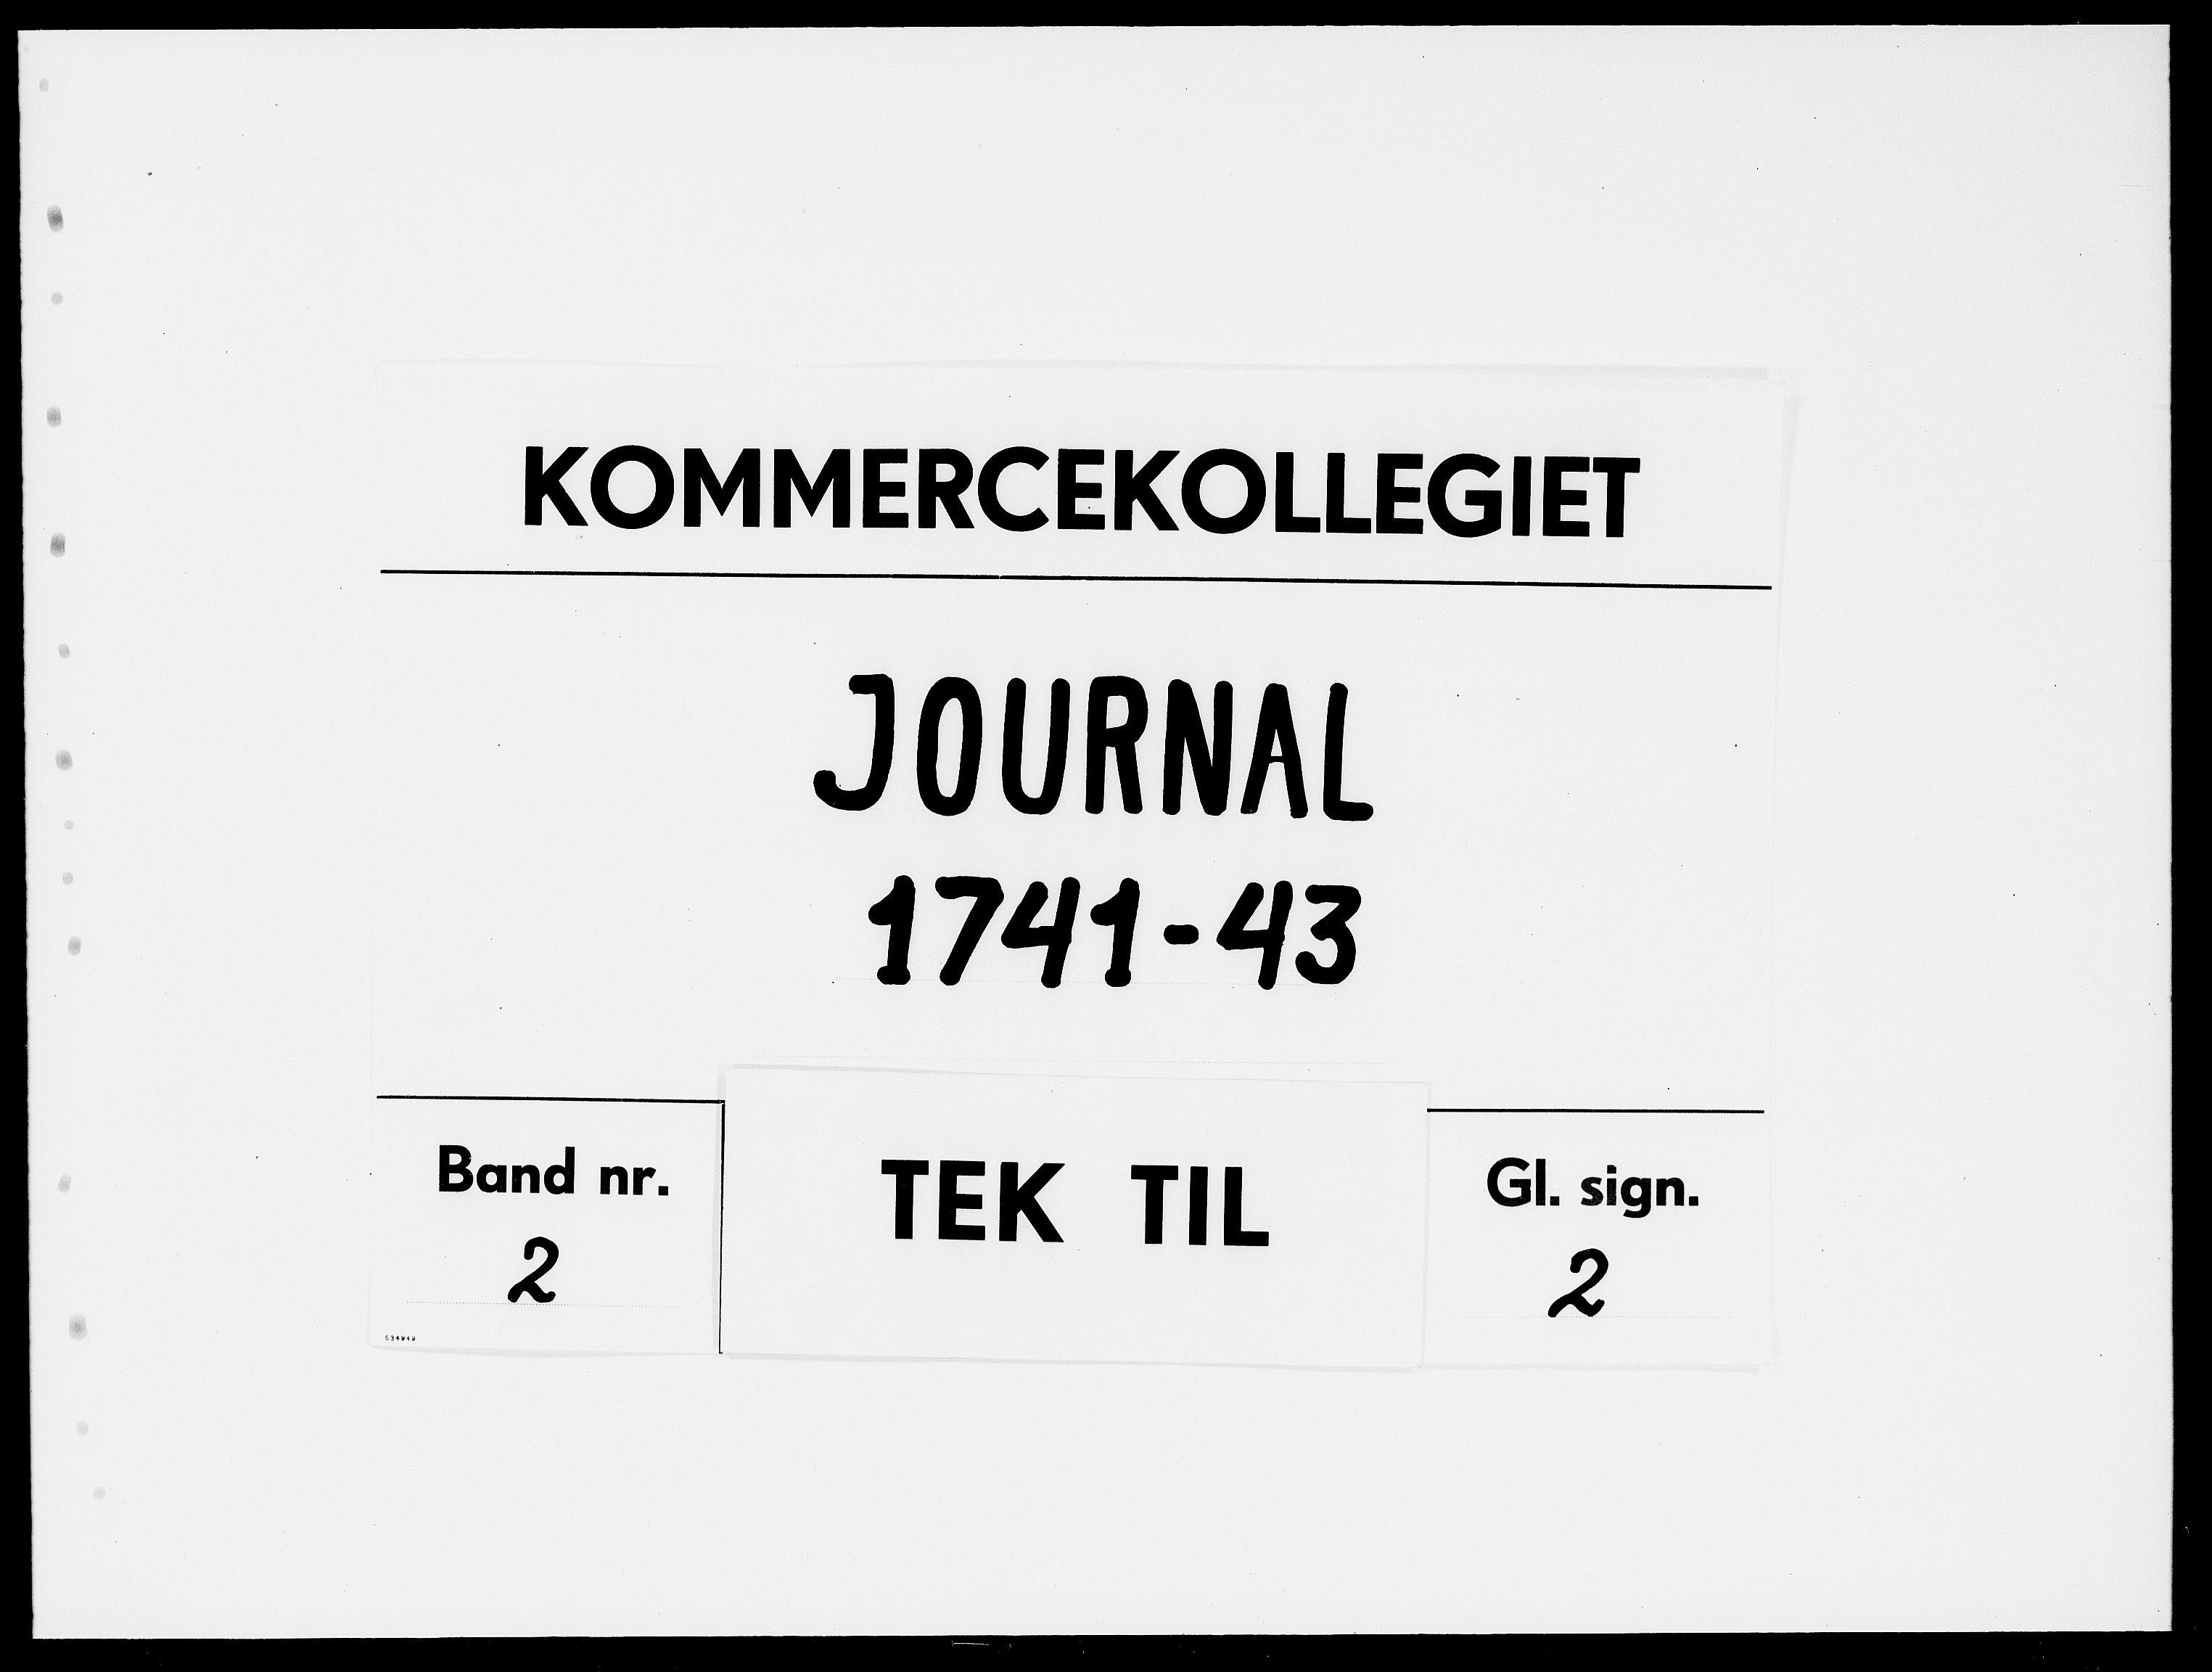 DRA, Kommercekollegiet, Dansk-Norske Sekretariat, -/50: Journal nr. 2, 1741-1743